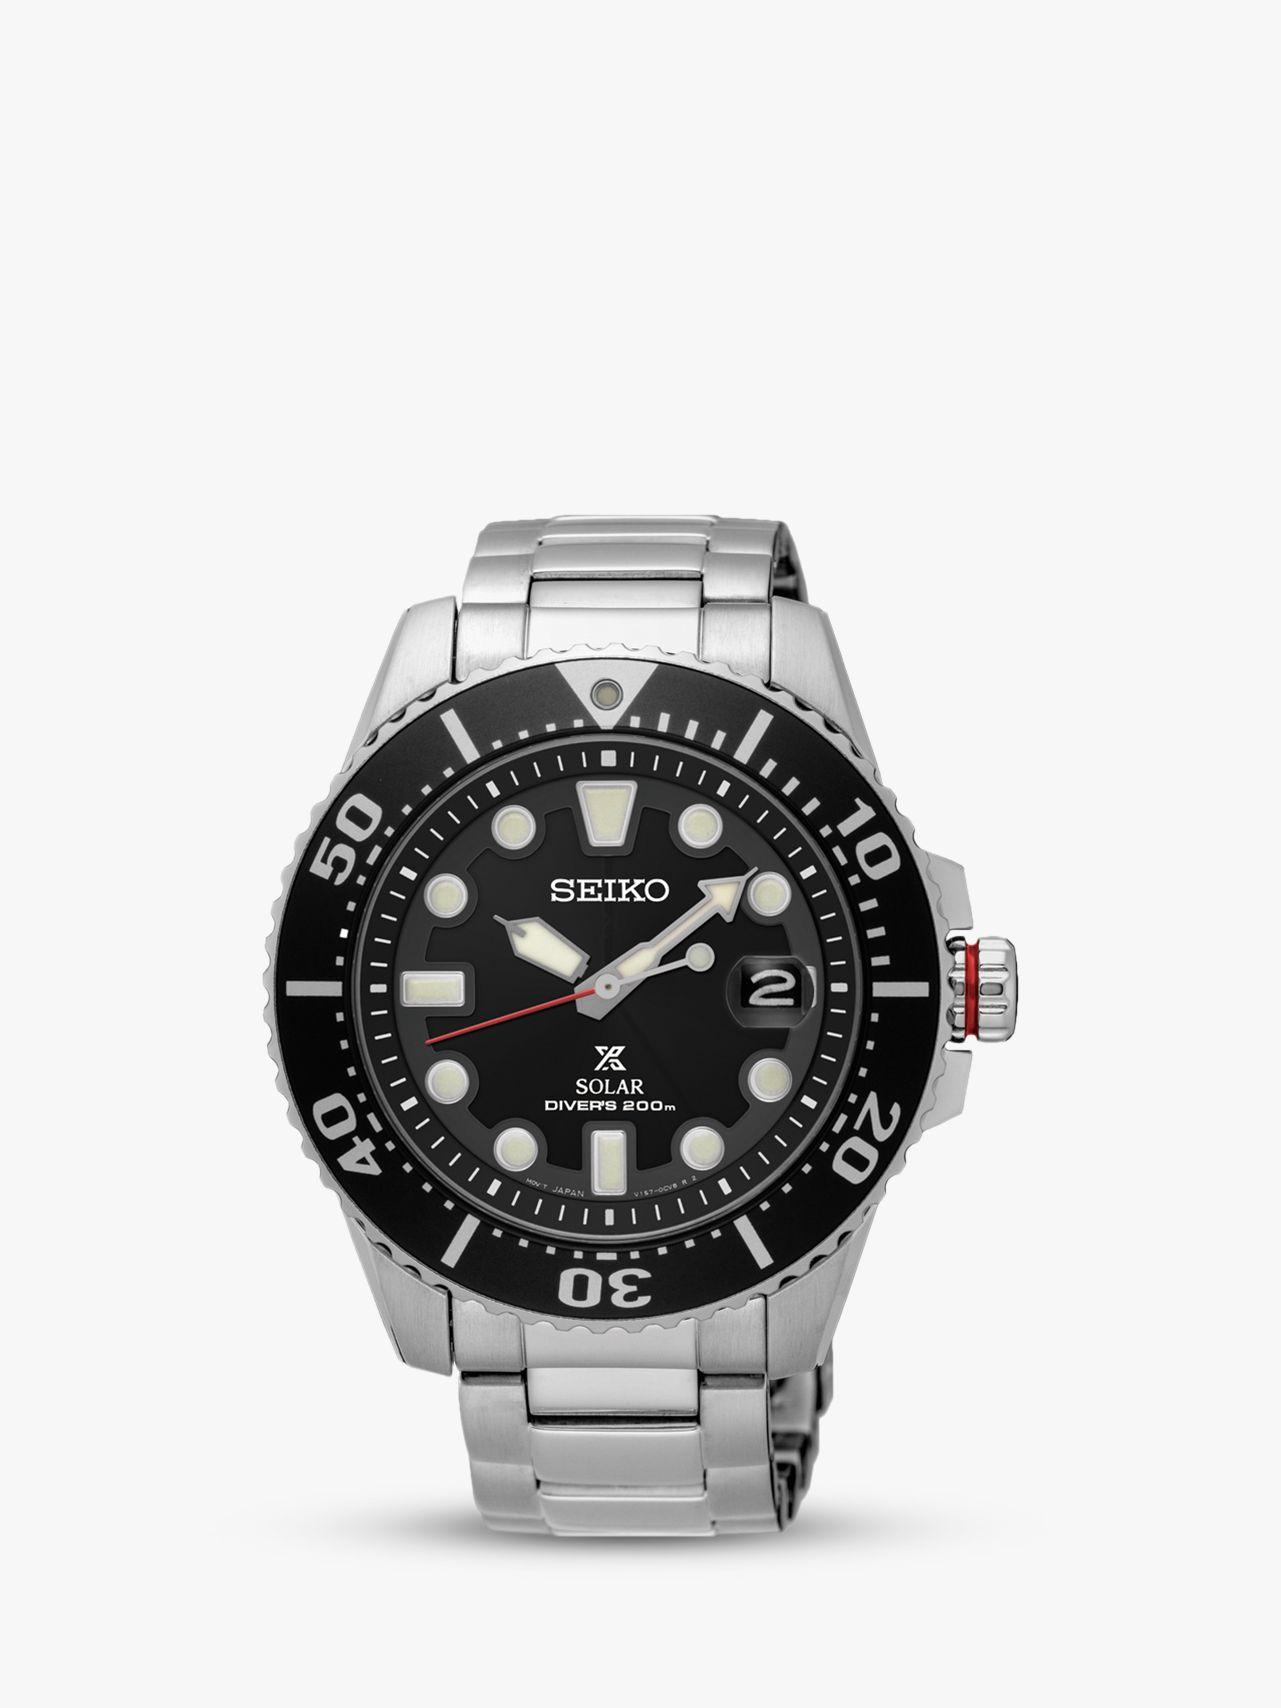 Seiko Seiko SNE437P1 Men's Prospex Divers Solar Date Bracelet Strap Watch, Silver/Black